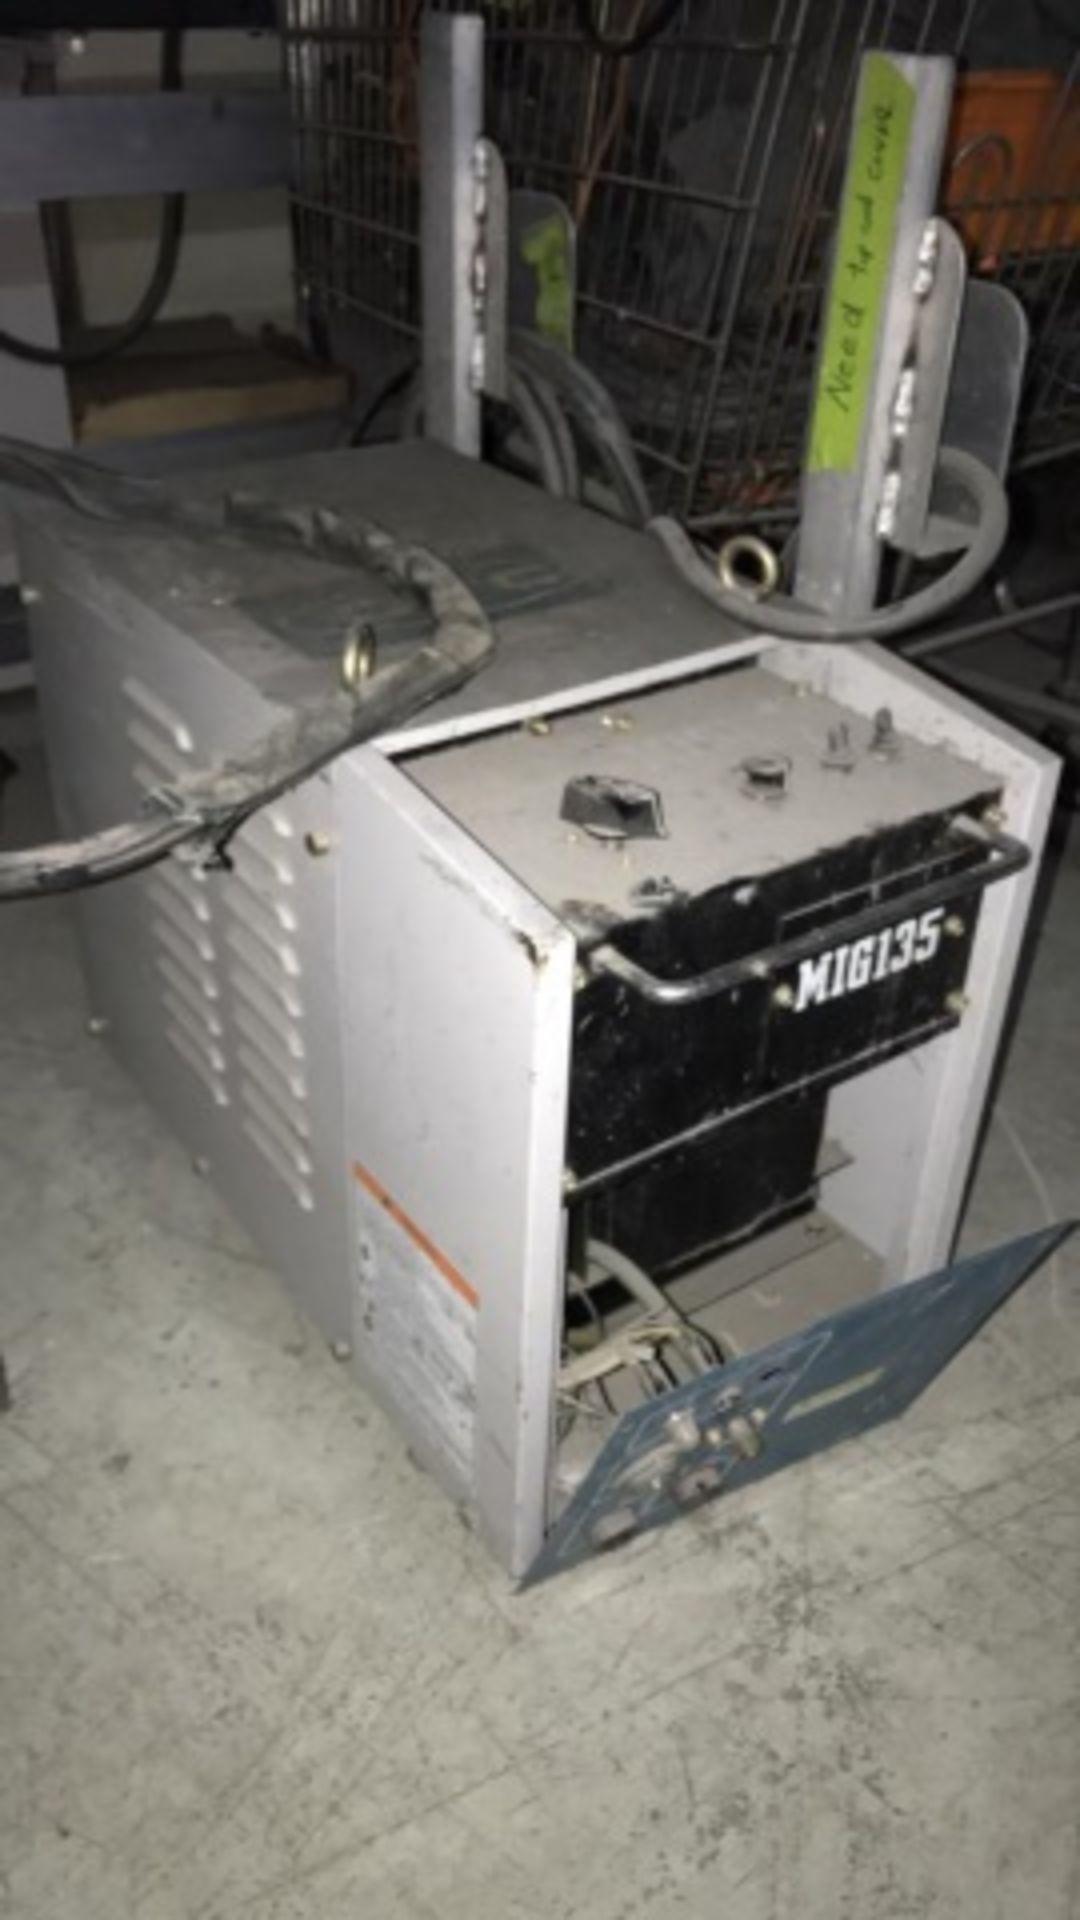 Daihen OTC Mig135 model CPSS-135 DC Power Source - Image 2 of 2